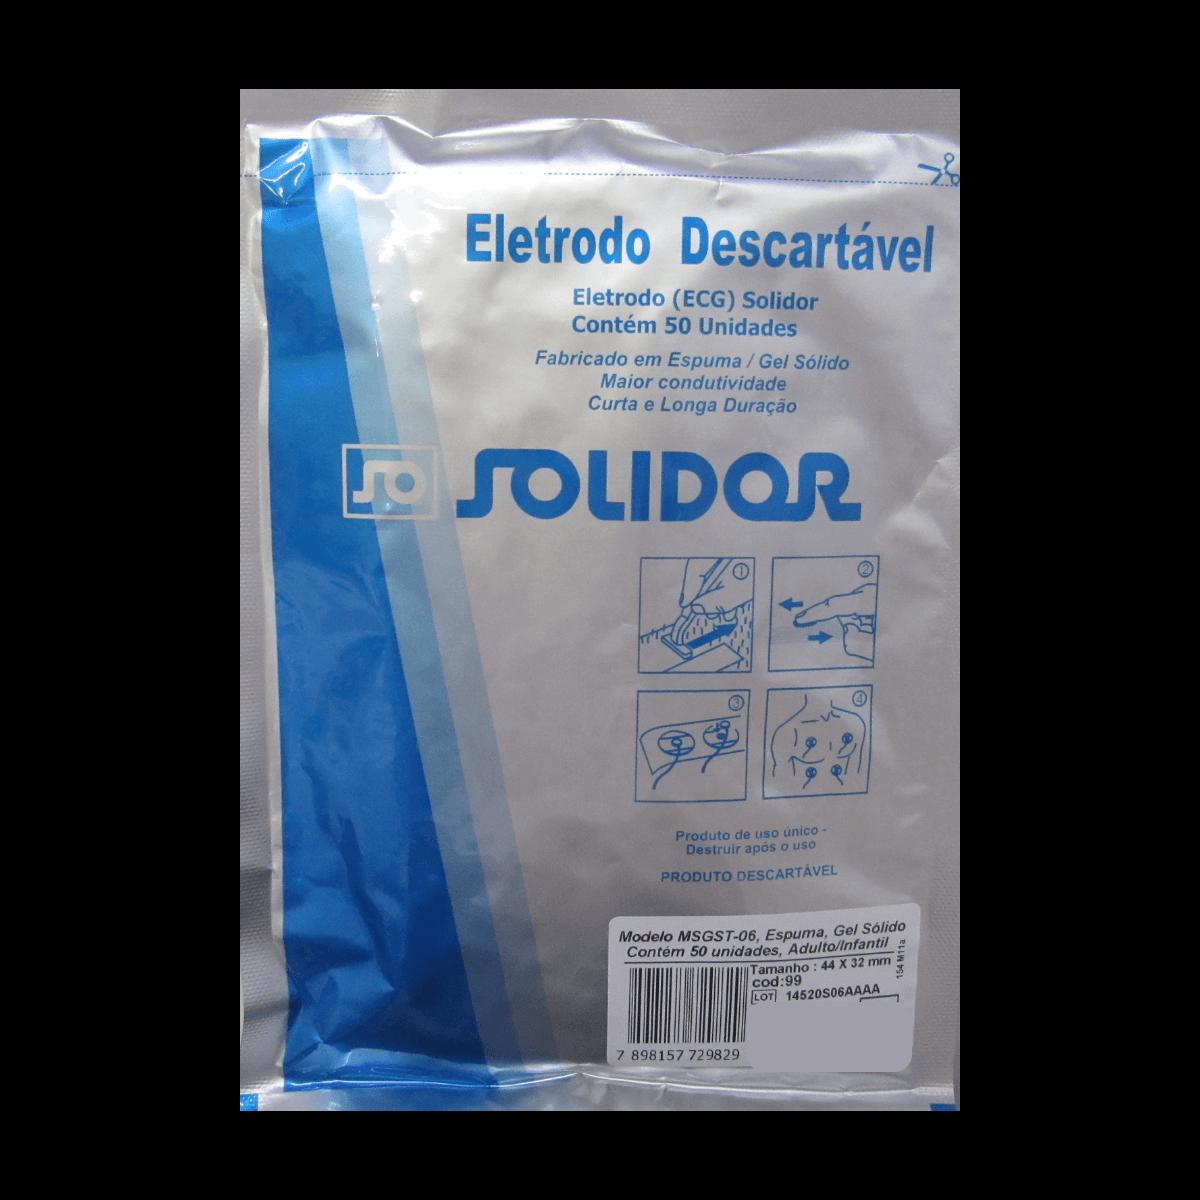 Eletrodo Descartável Eletrocardiograma ECG 50un Solidor